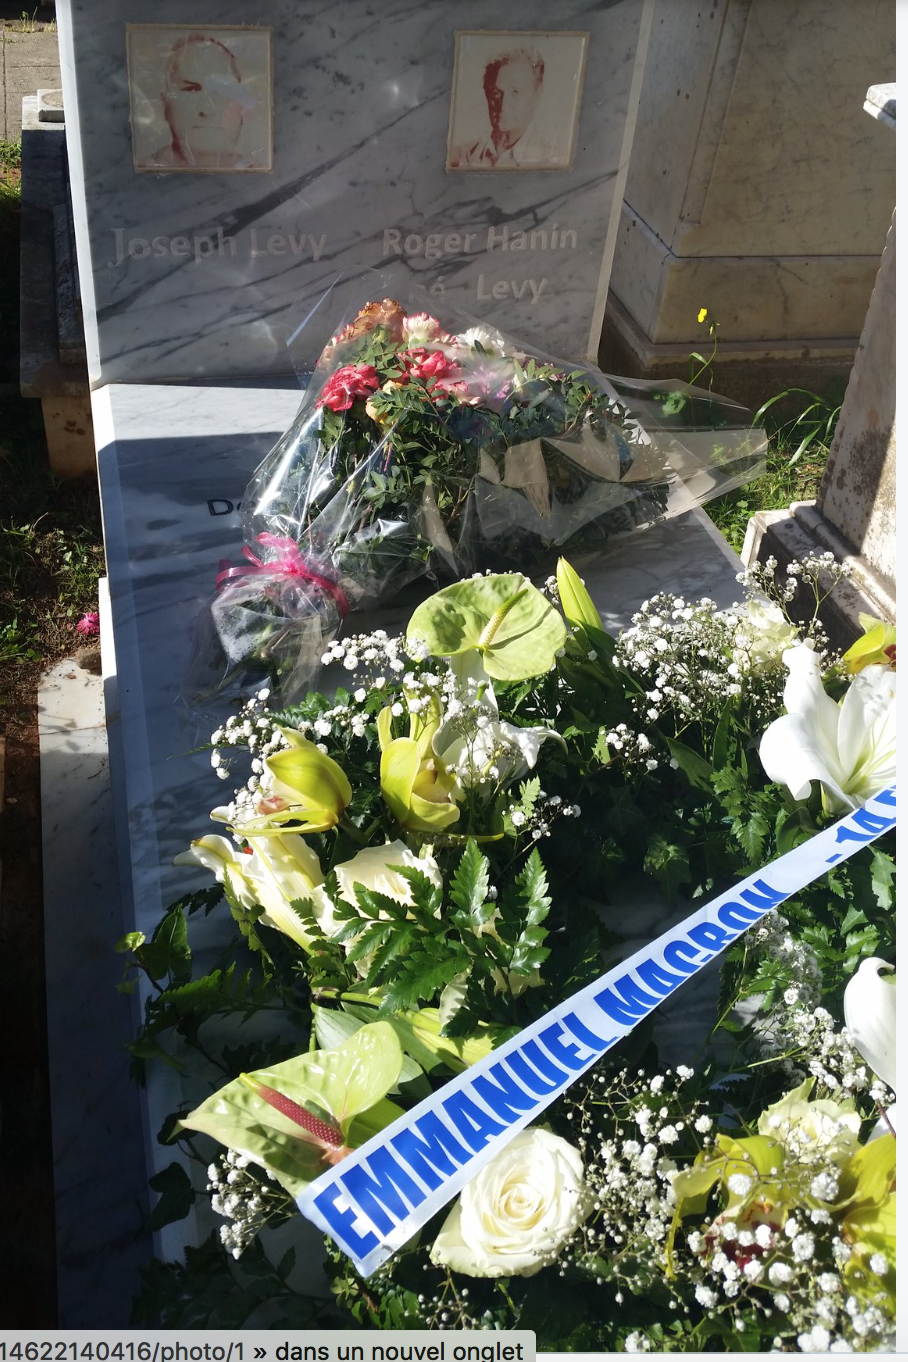 Macron à Alger a sali la tombe de Roger Hanin